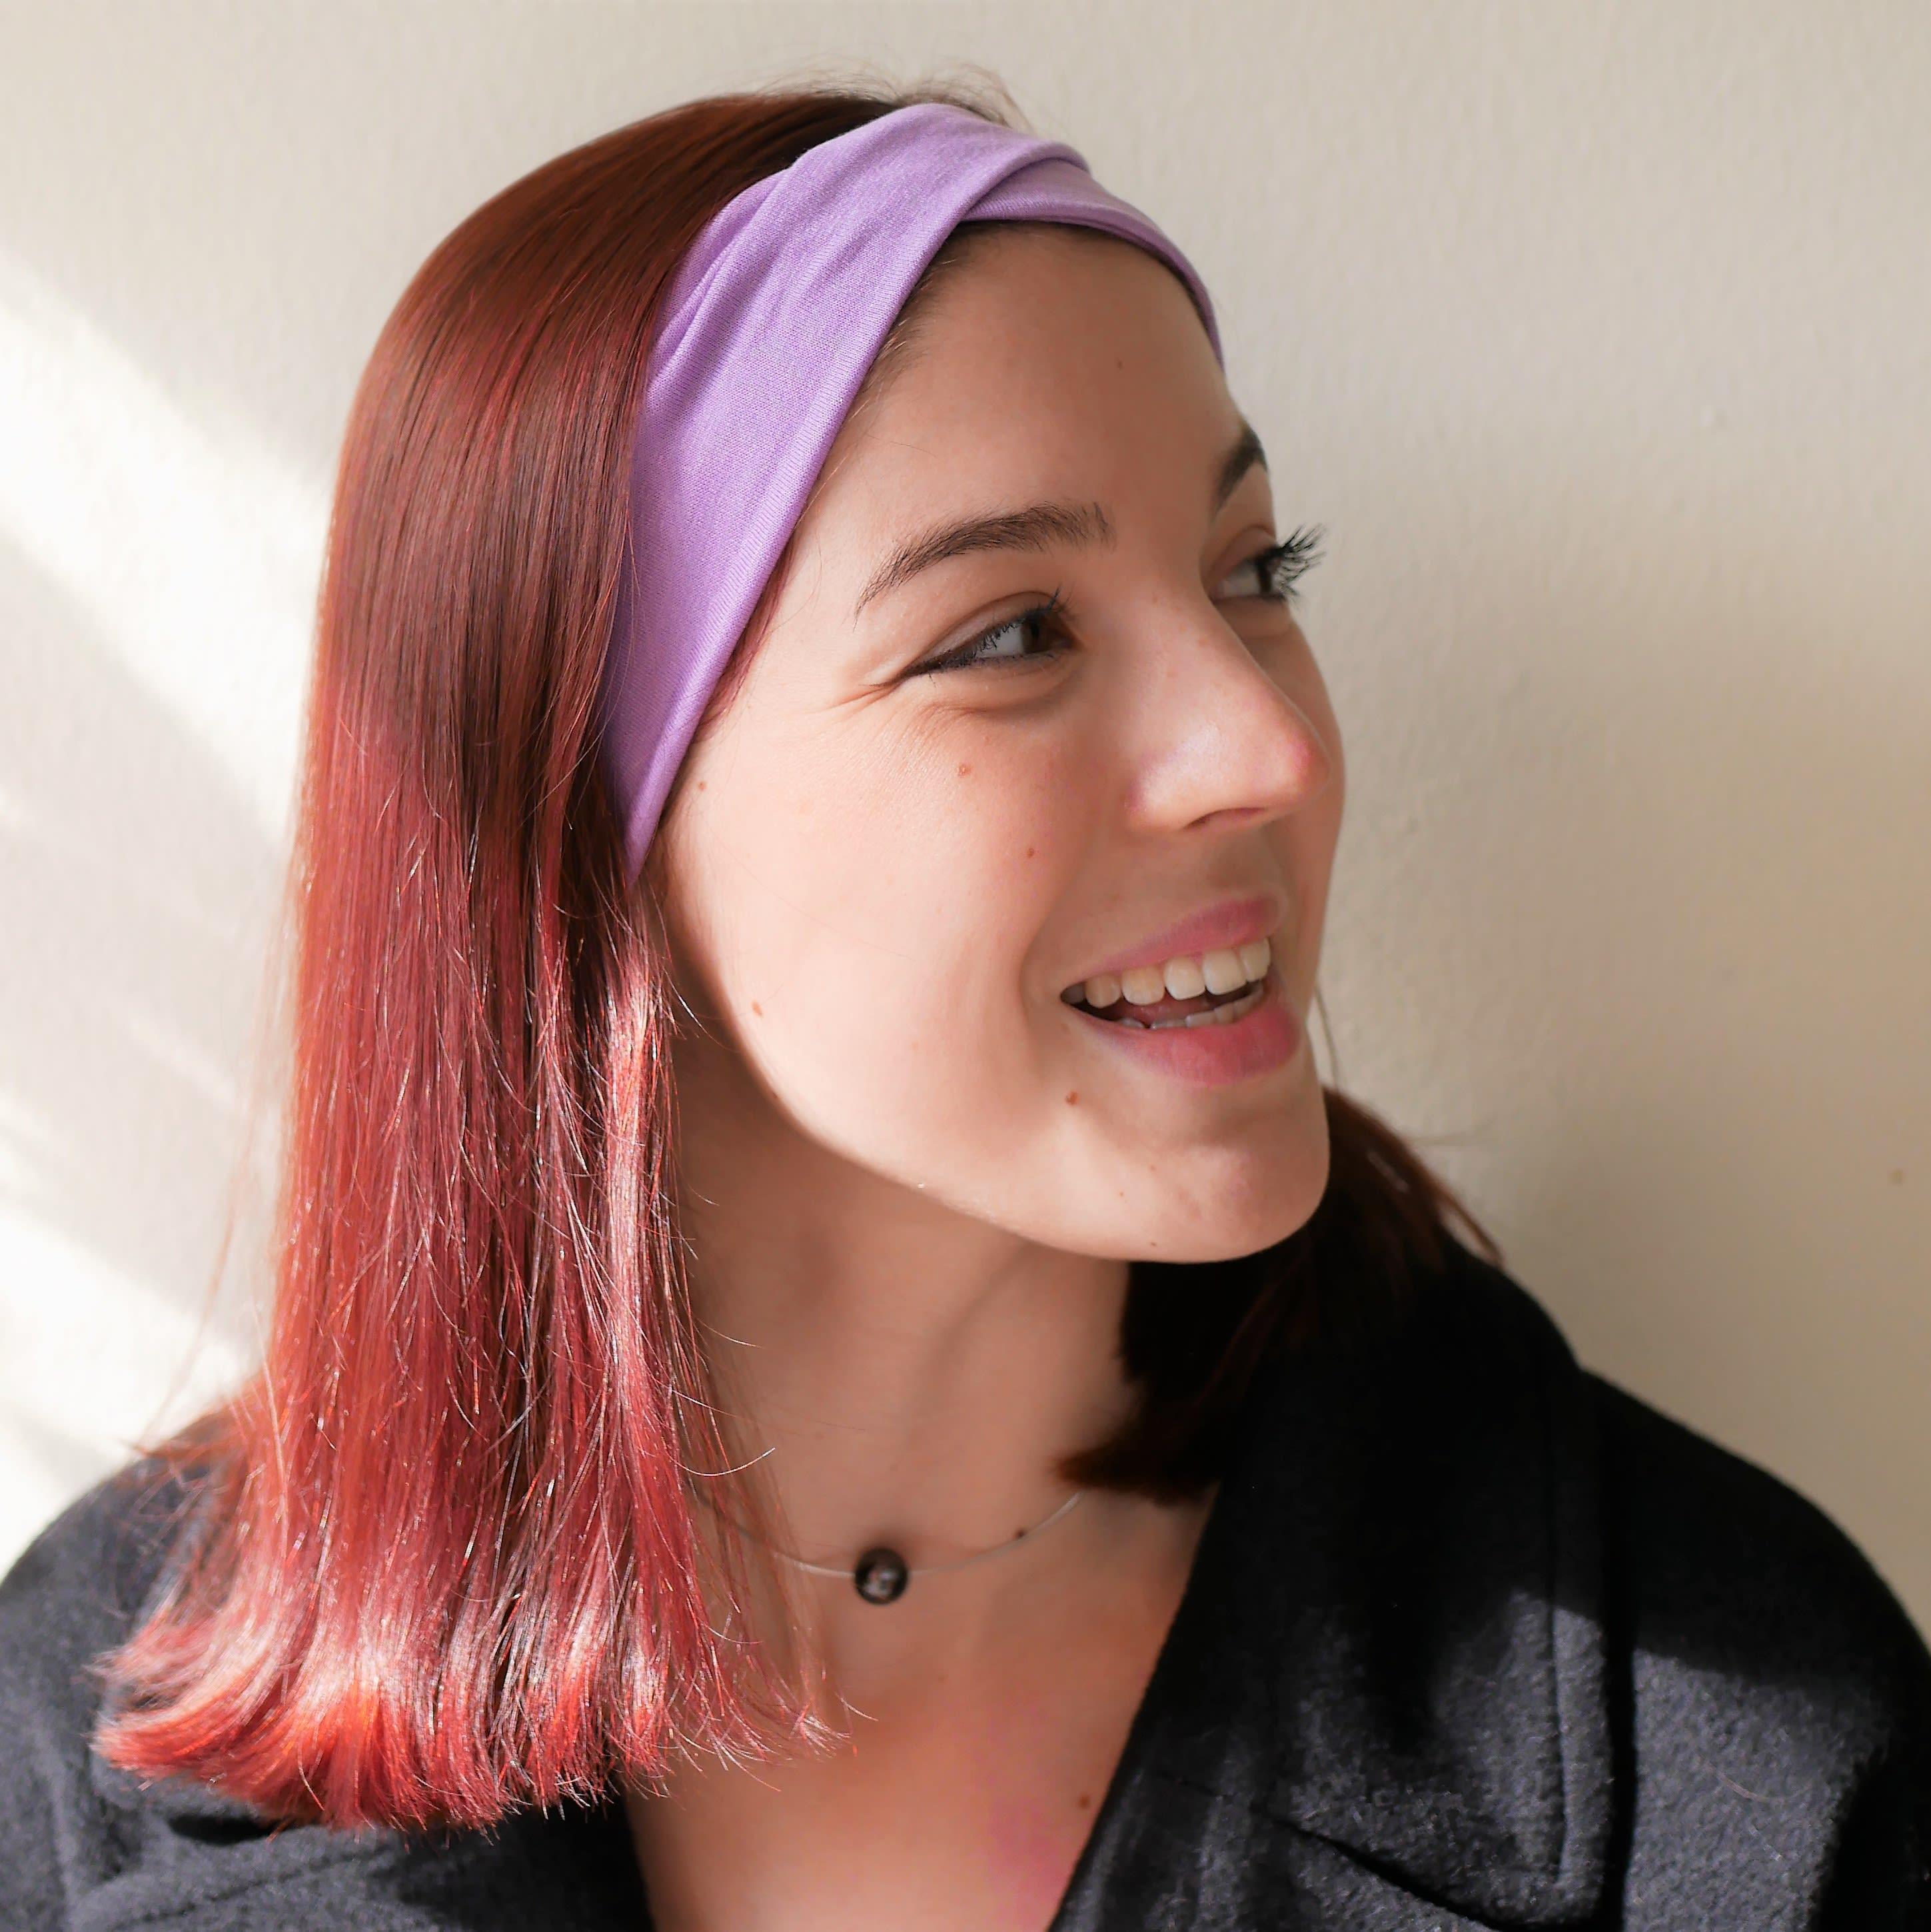 Double twist purple headband, wide headband, turban headband, yoga headband, workout headband